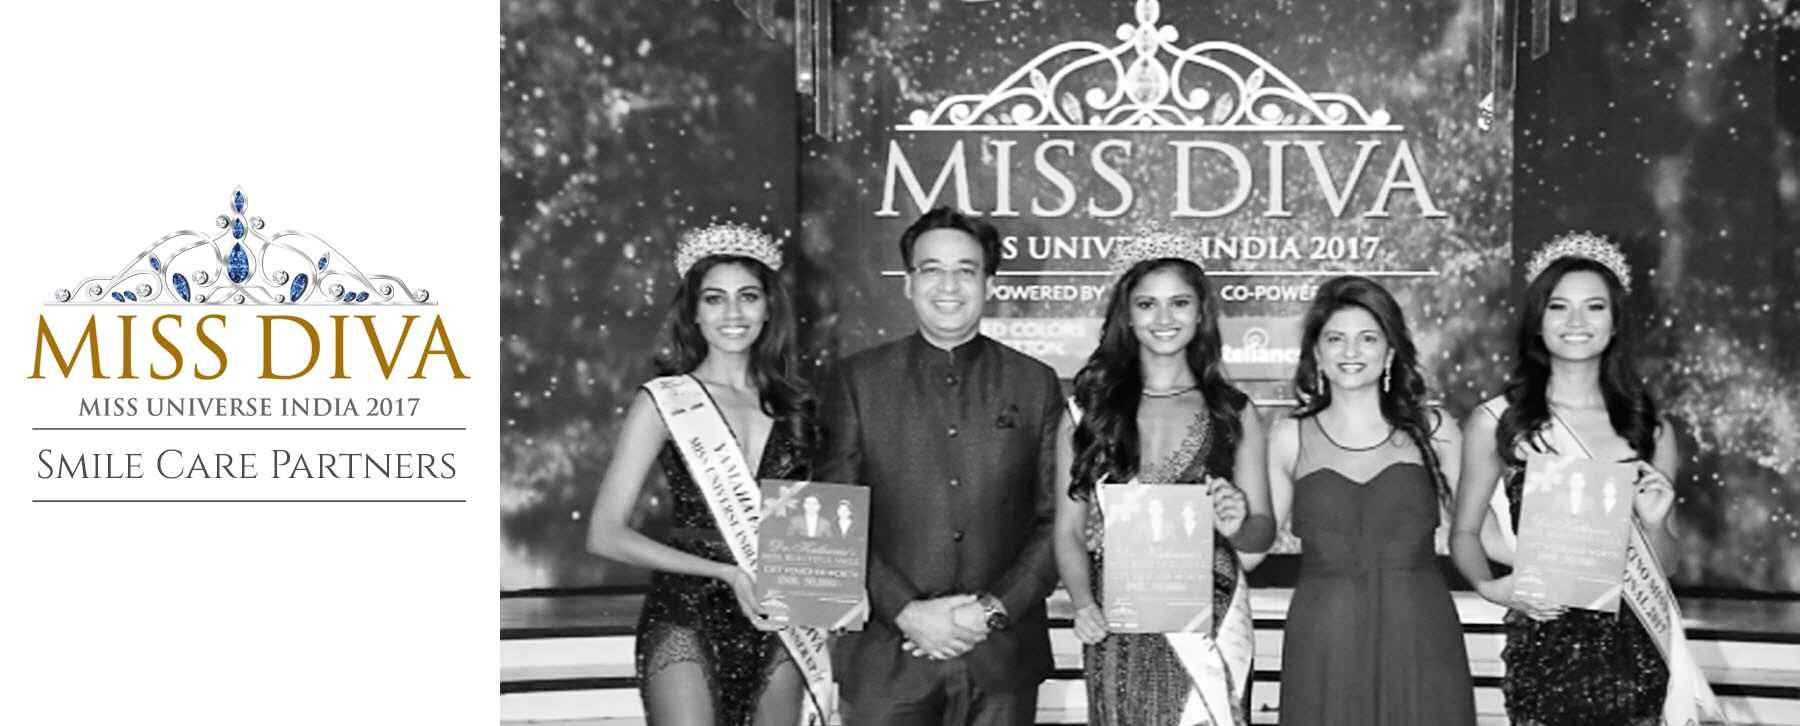 Miss Diva - Dr. Kathuria